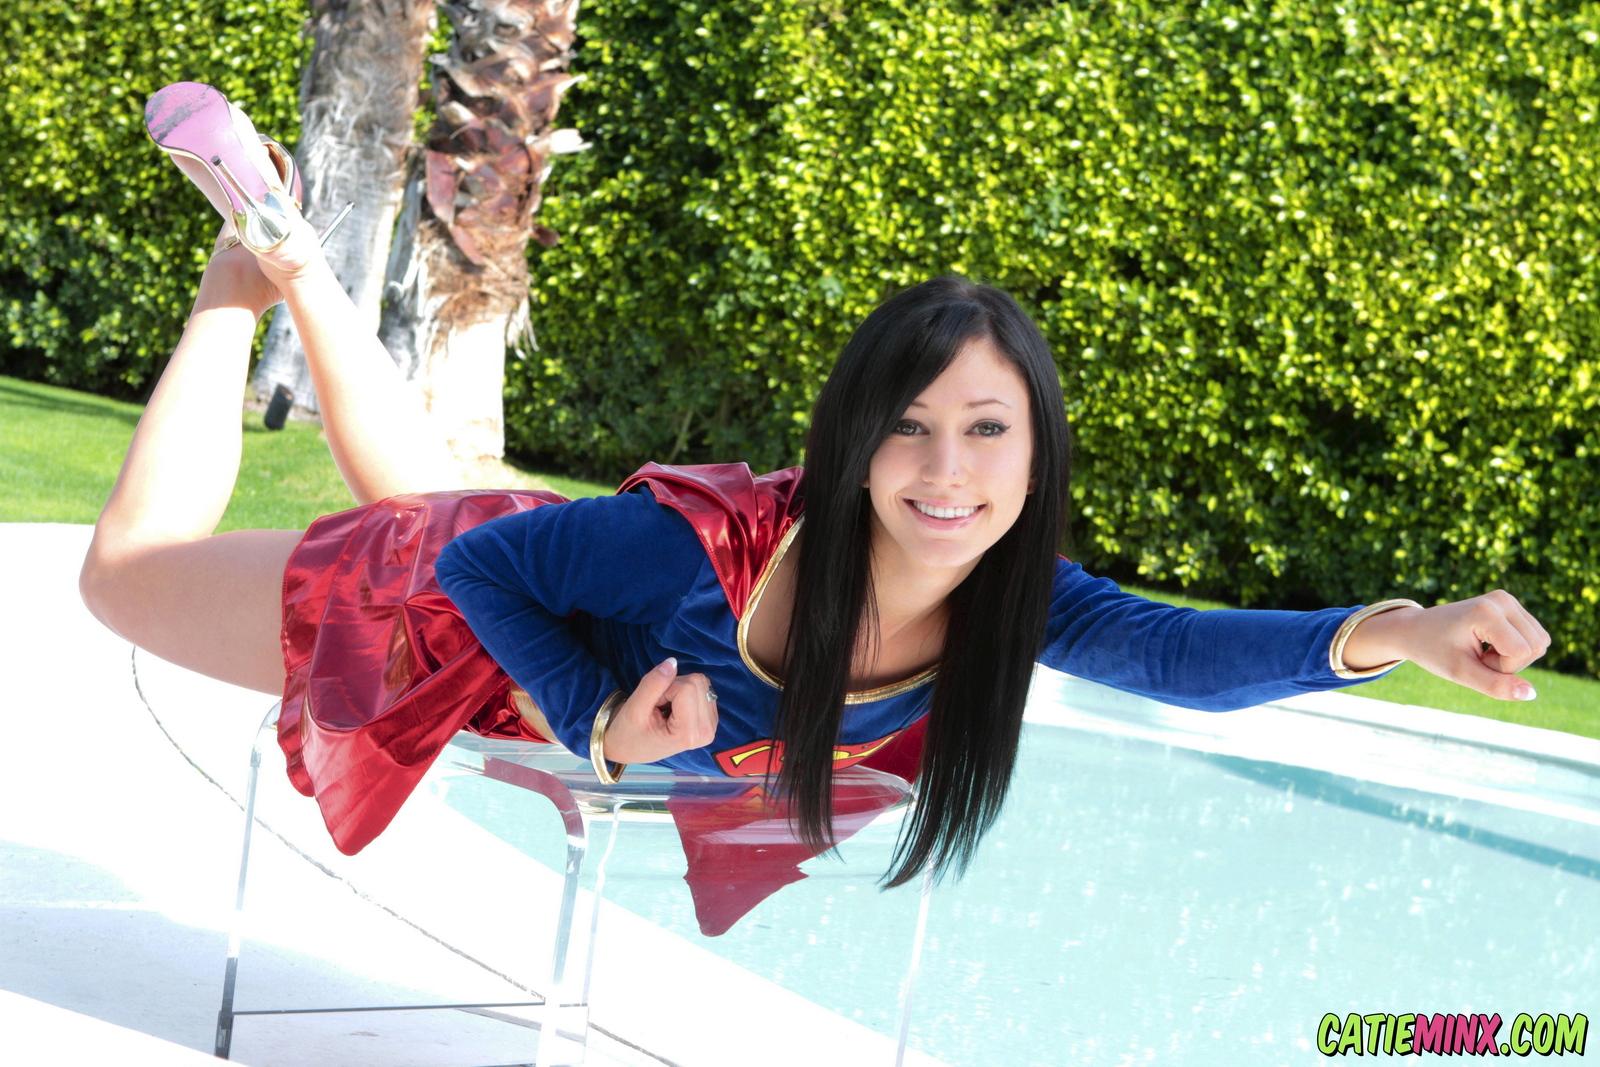 catie-minx-supergirl-costiume-poolside-young-brunette-nude-02